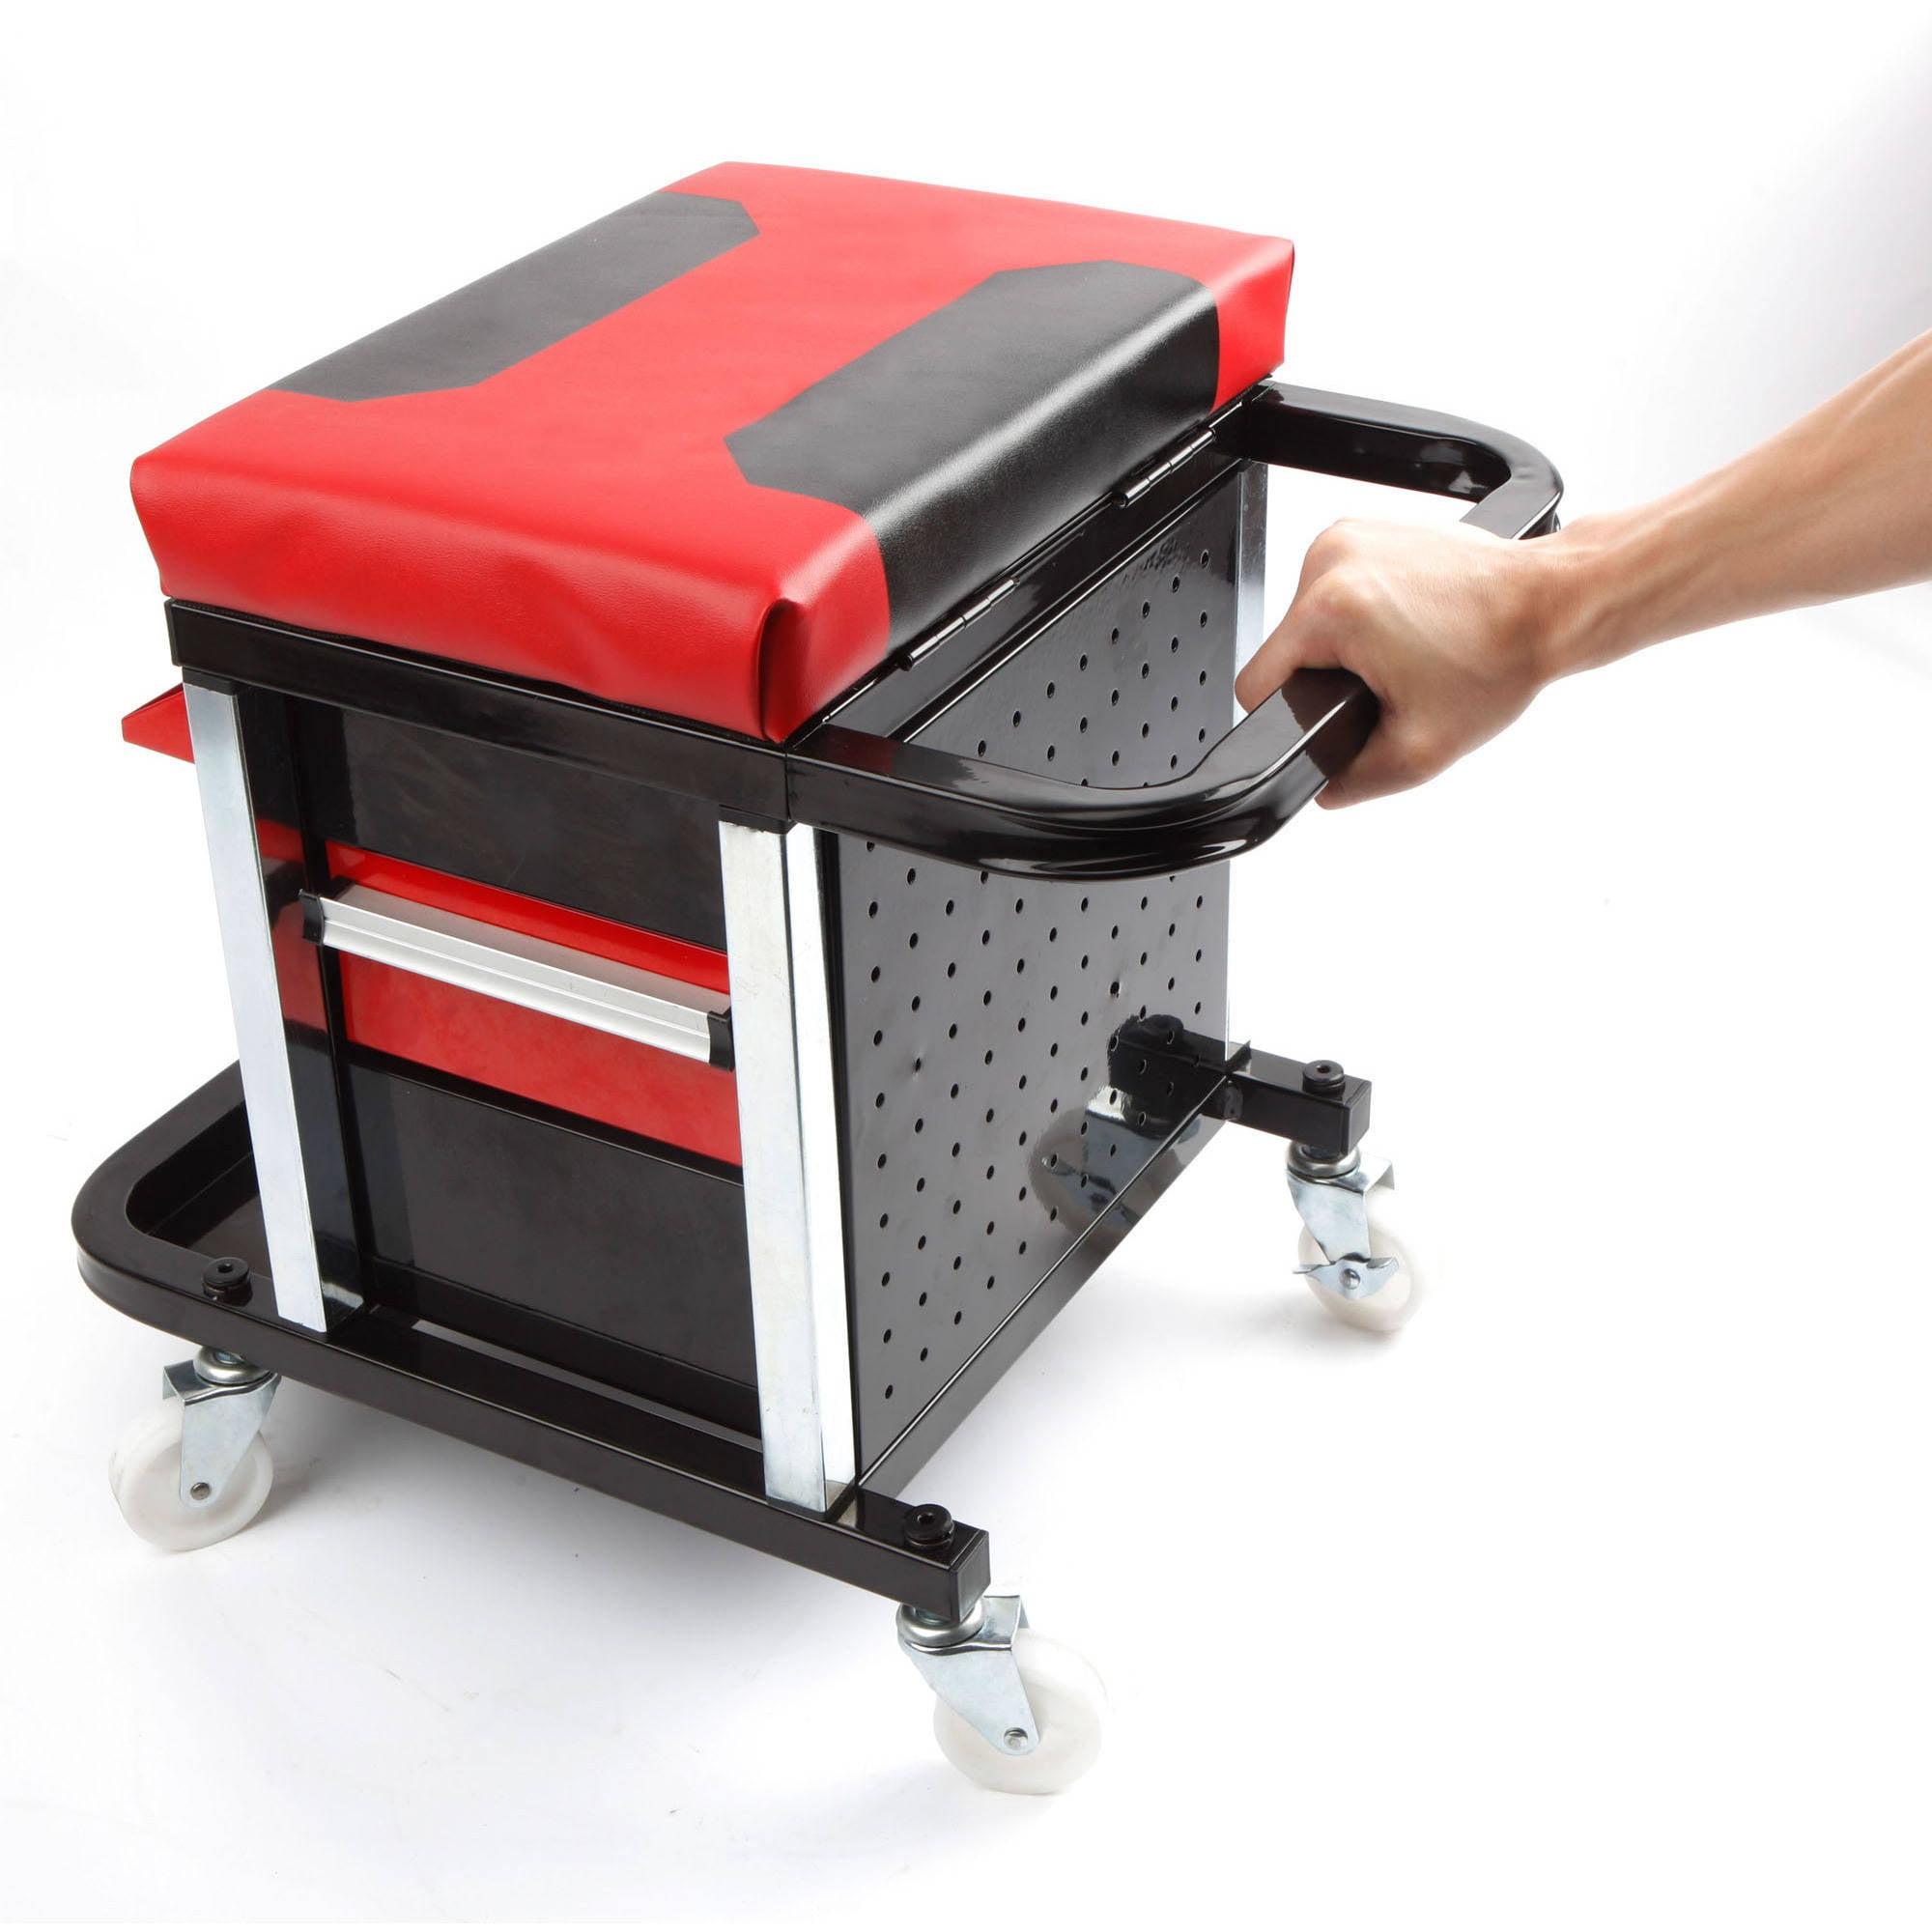 Mechanic Rolling Creeper 2 Drawer Seat Tool Box Chair